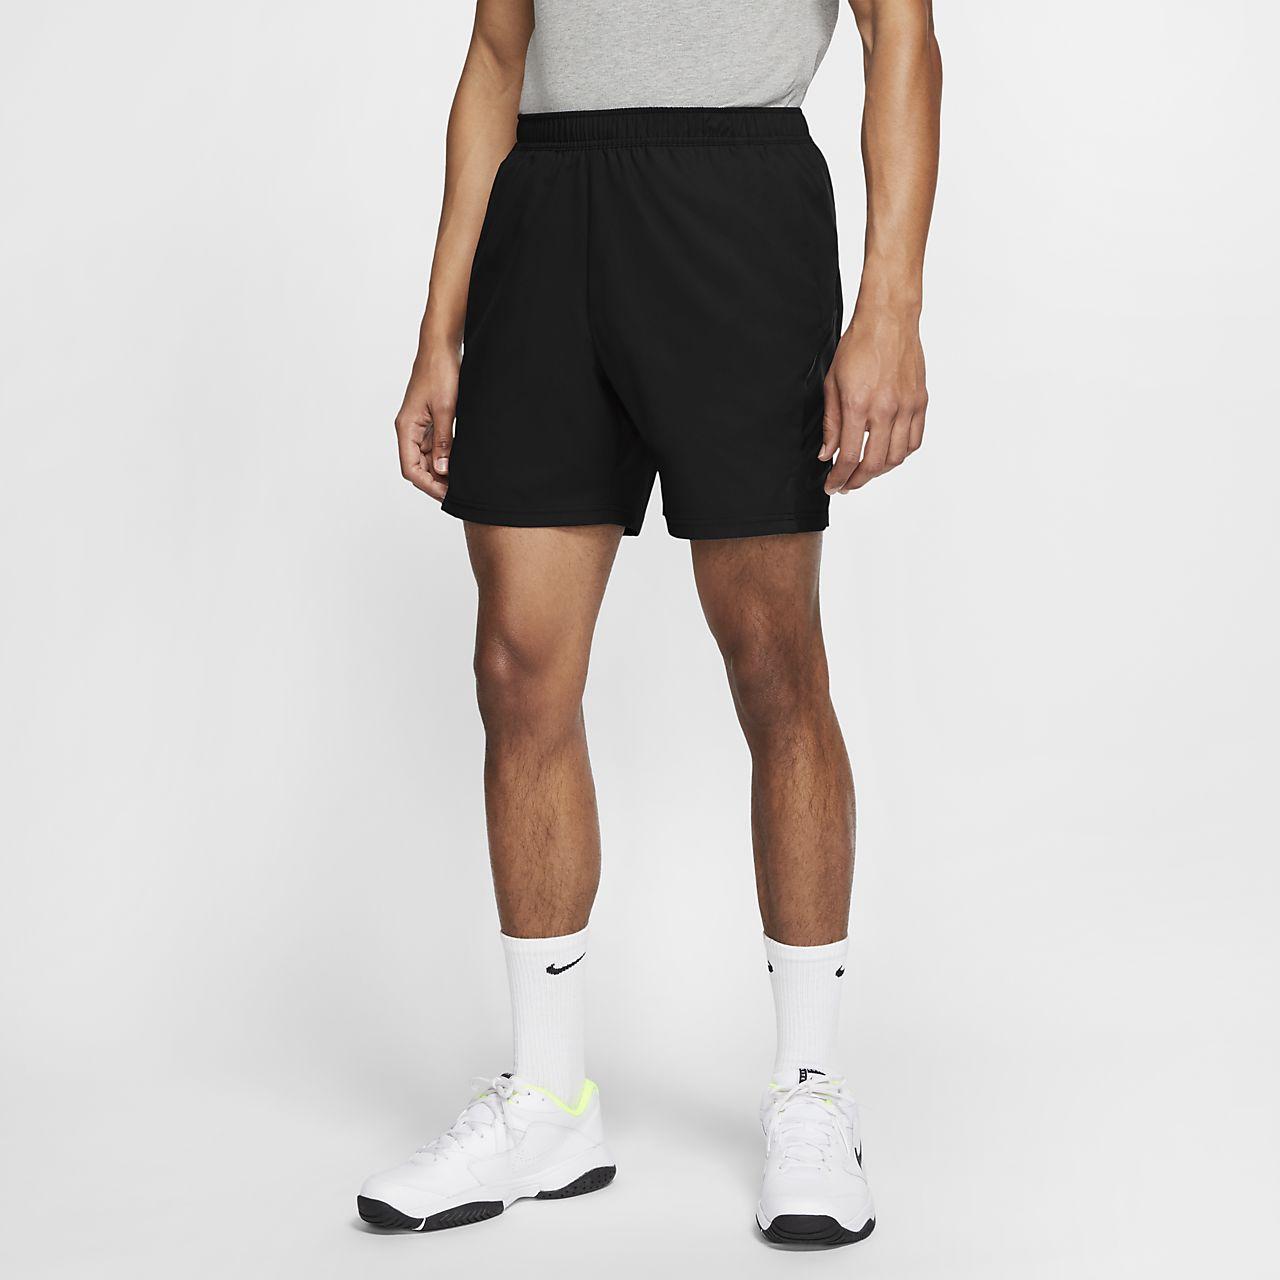 8e79c73df0c3f NikeCourt Dri-FIT Men s 7